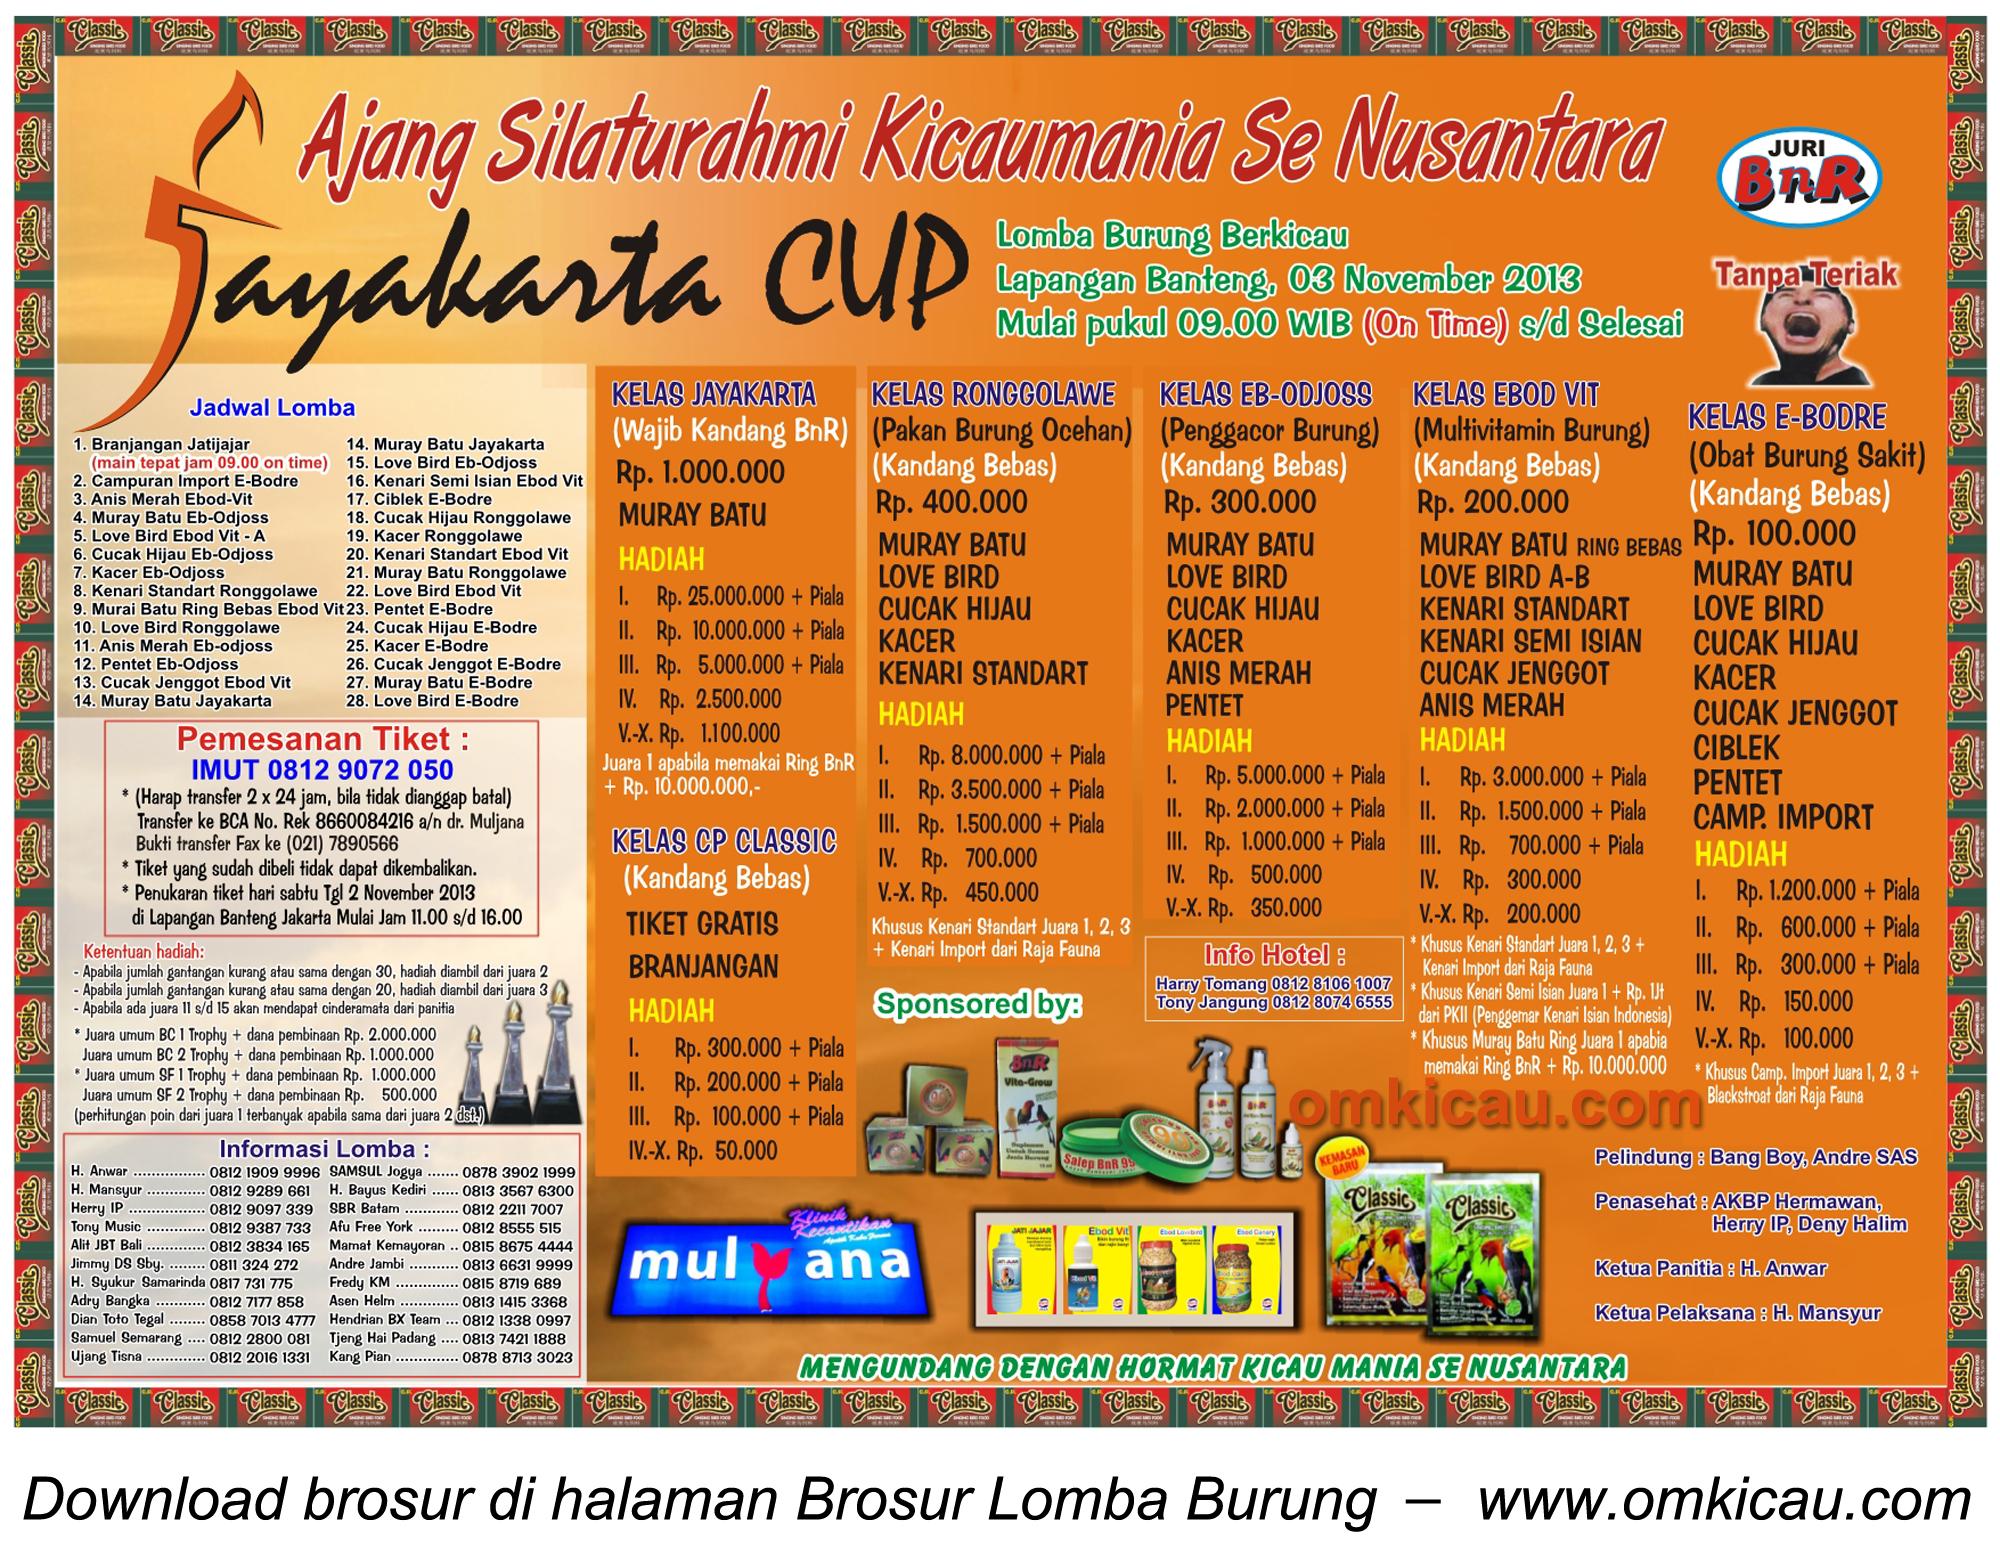 Brosur Lomba Burung Berkicau JAYAKARTA CUP, Jakarta, 3 November 2013